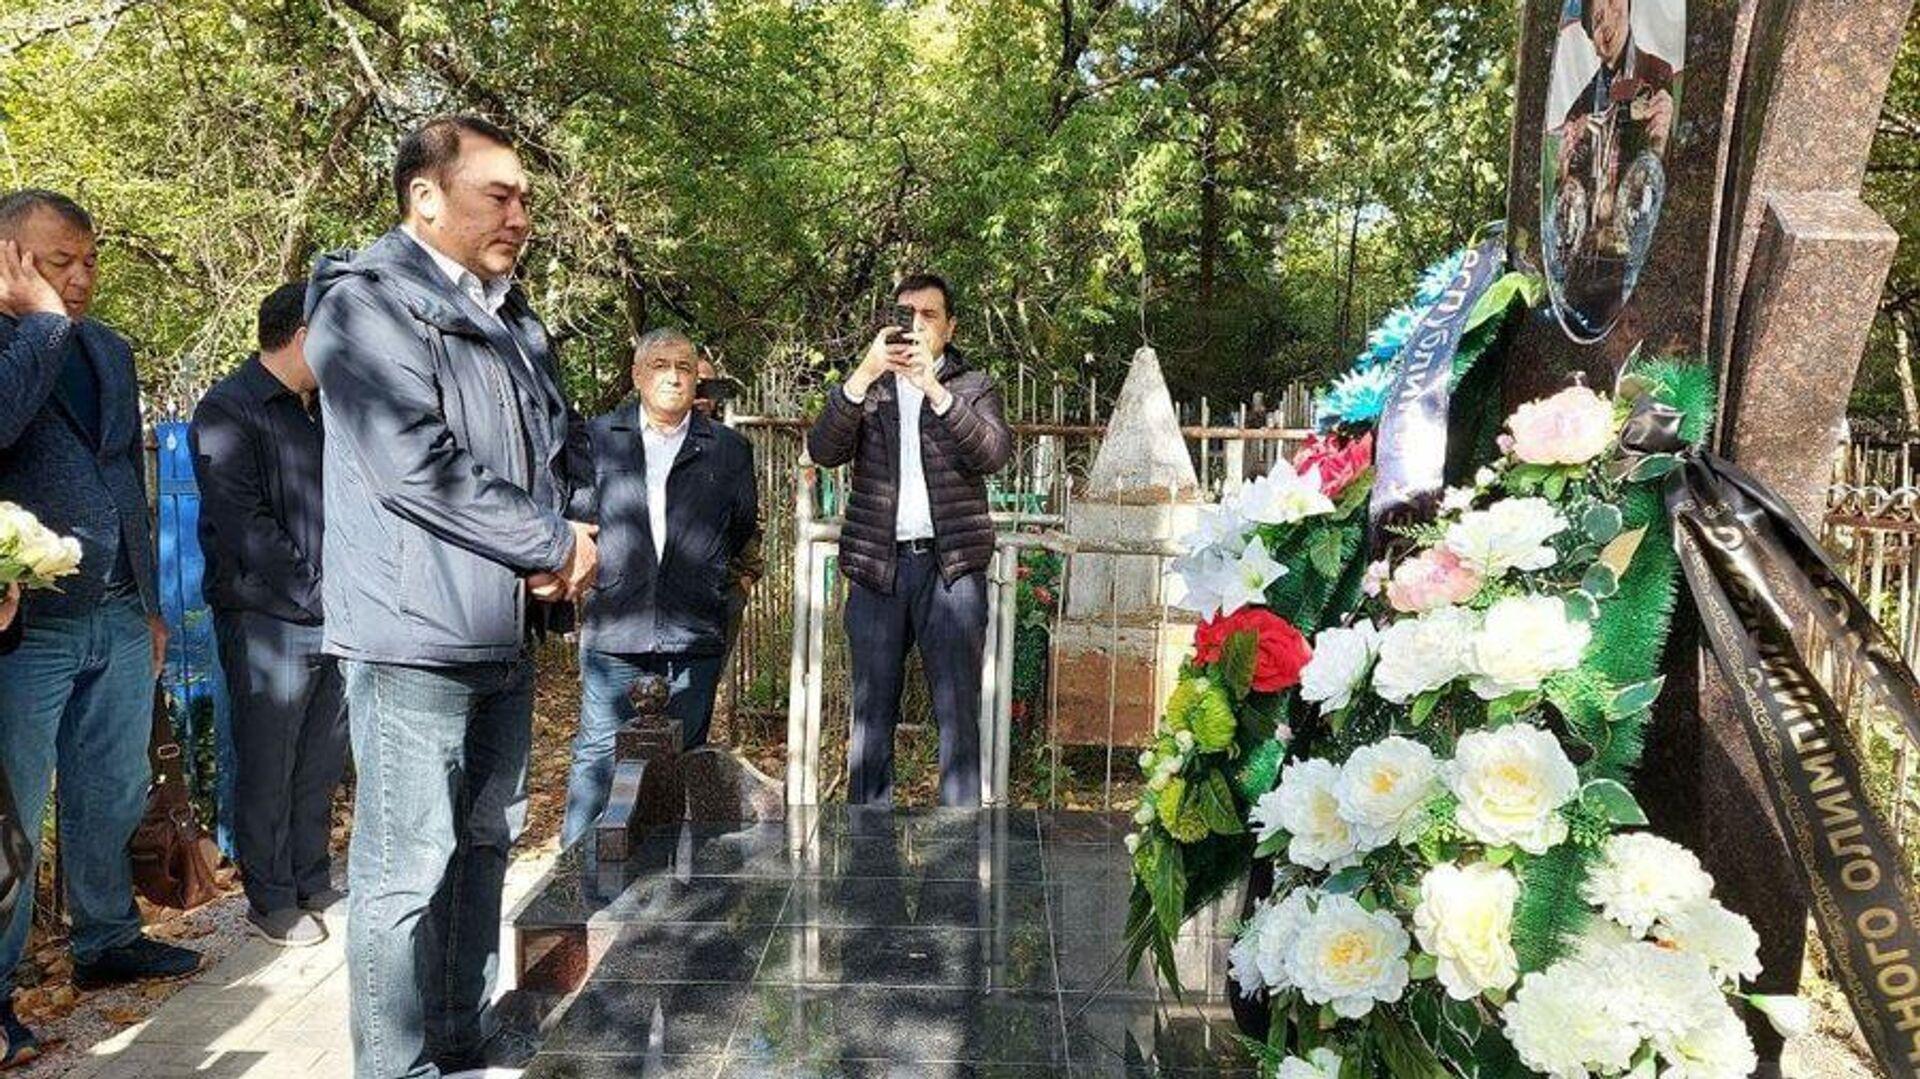 V Novosibirske ustanovili pamyatnik na mogile Linы Cheryazovoy - Sputnik Oʻzbekiston, 1920, 10.09.2021